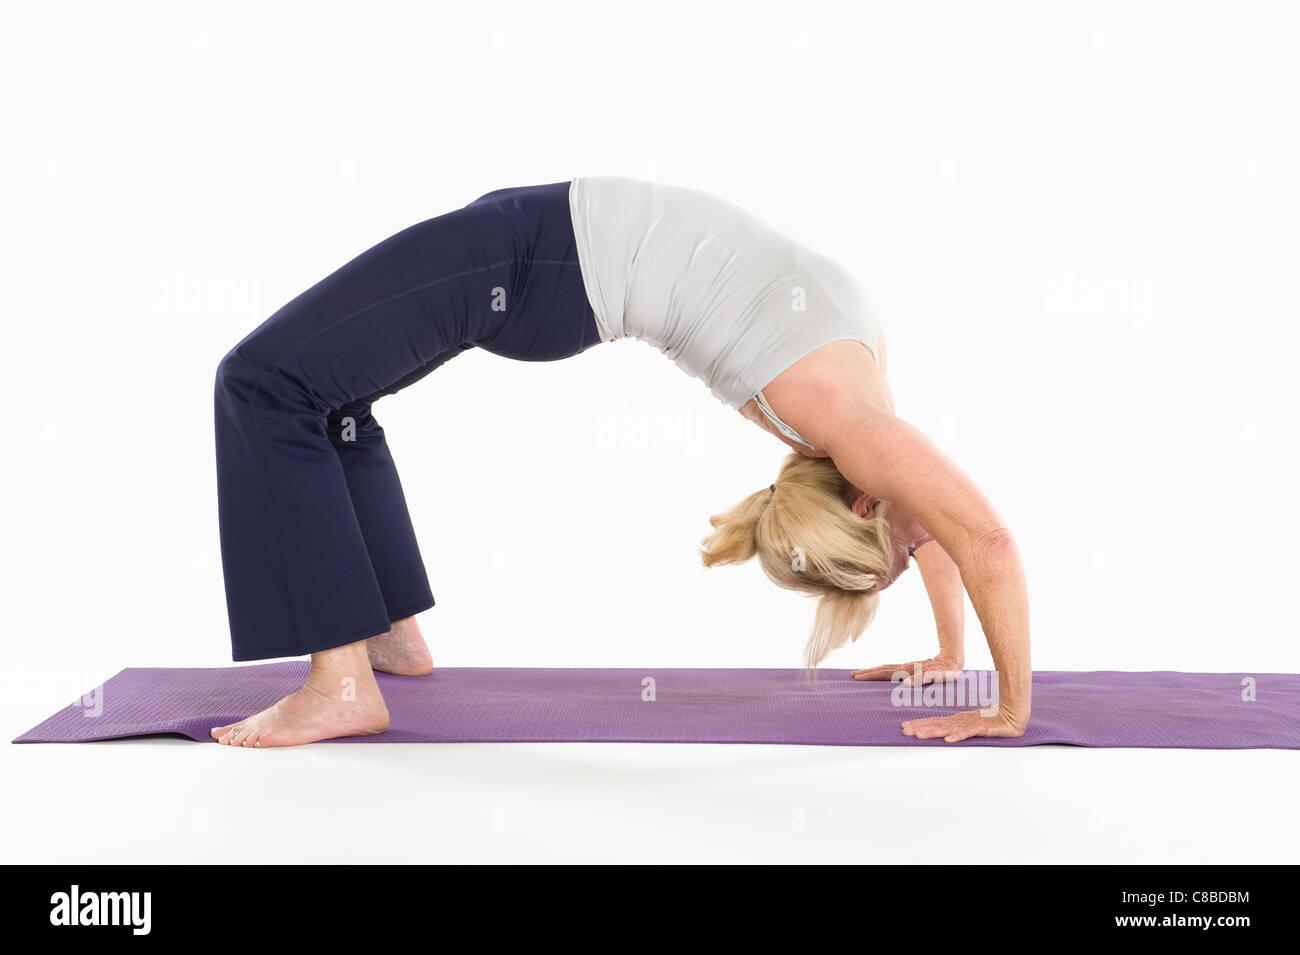 Woman in backbend yoga pose - Stock Image